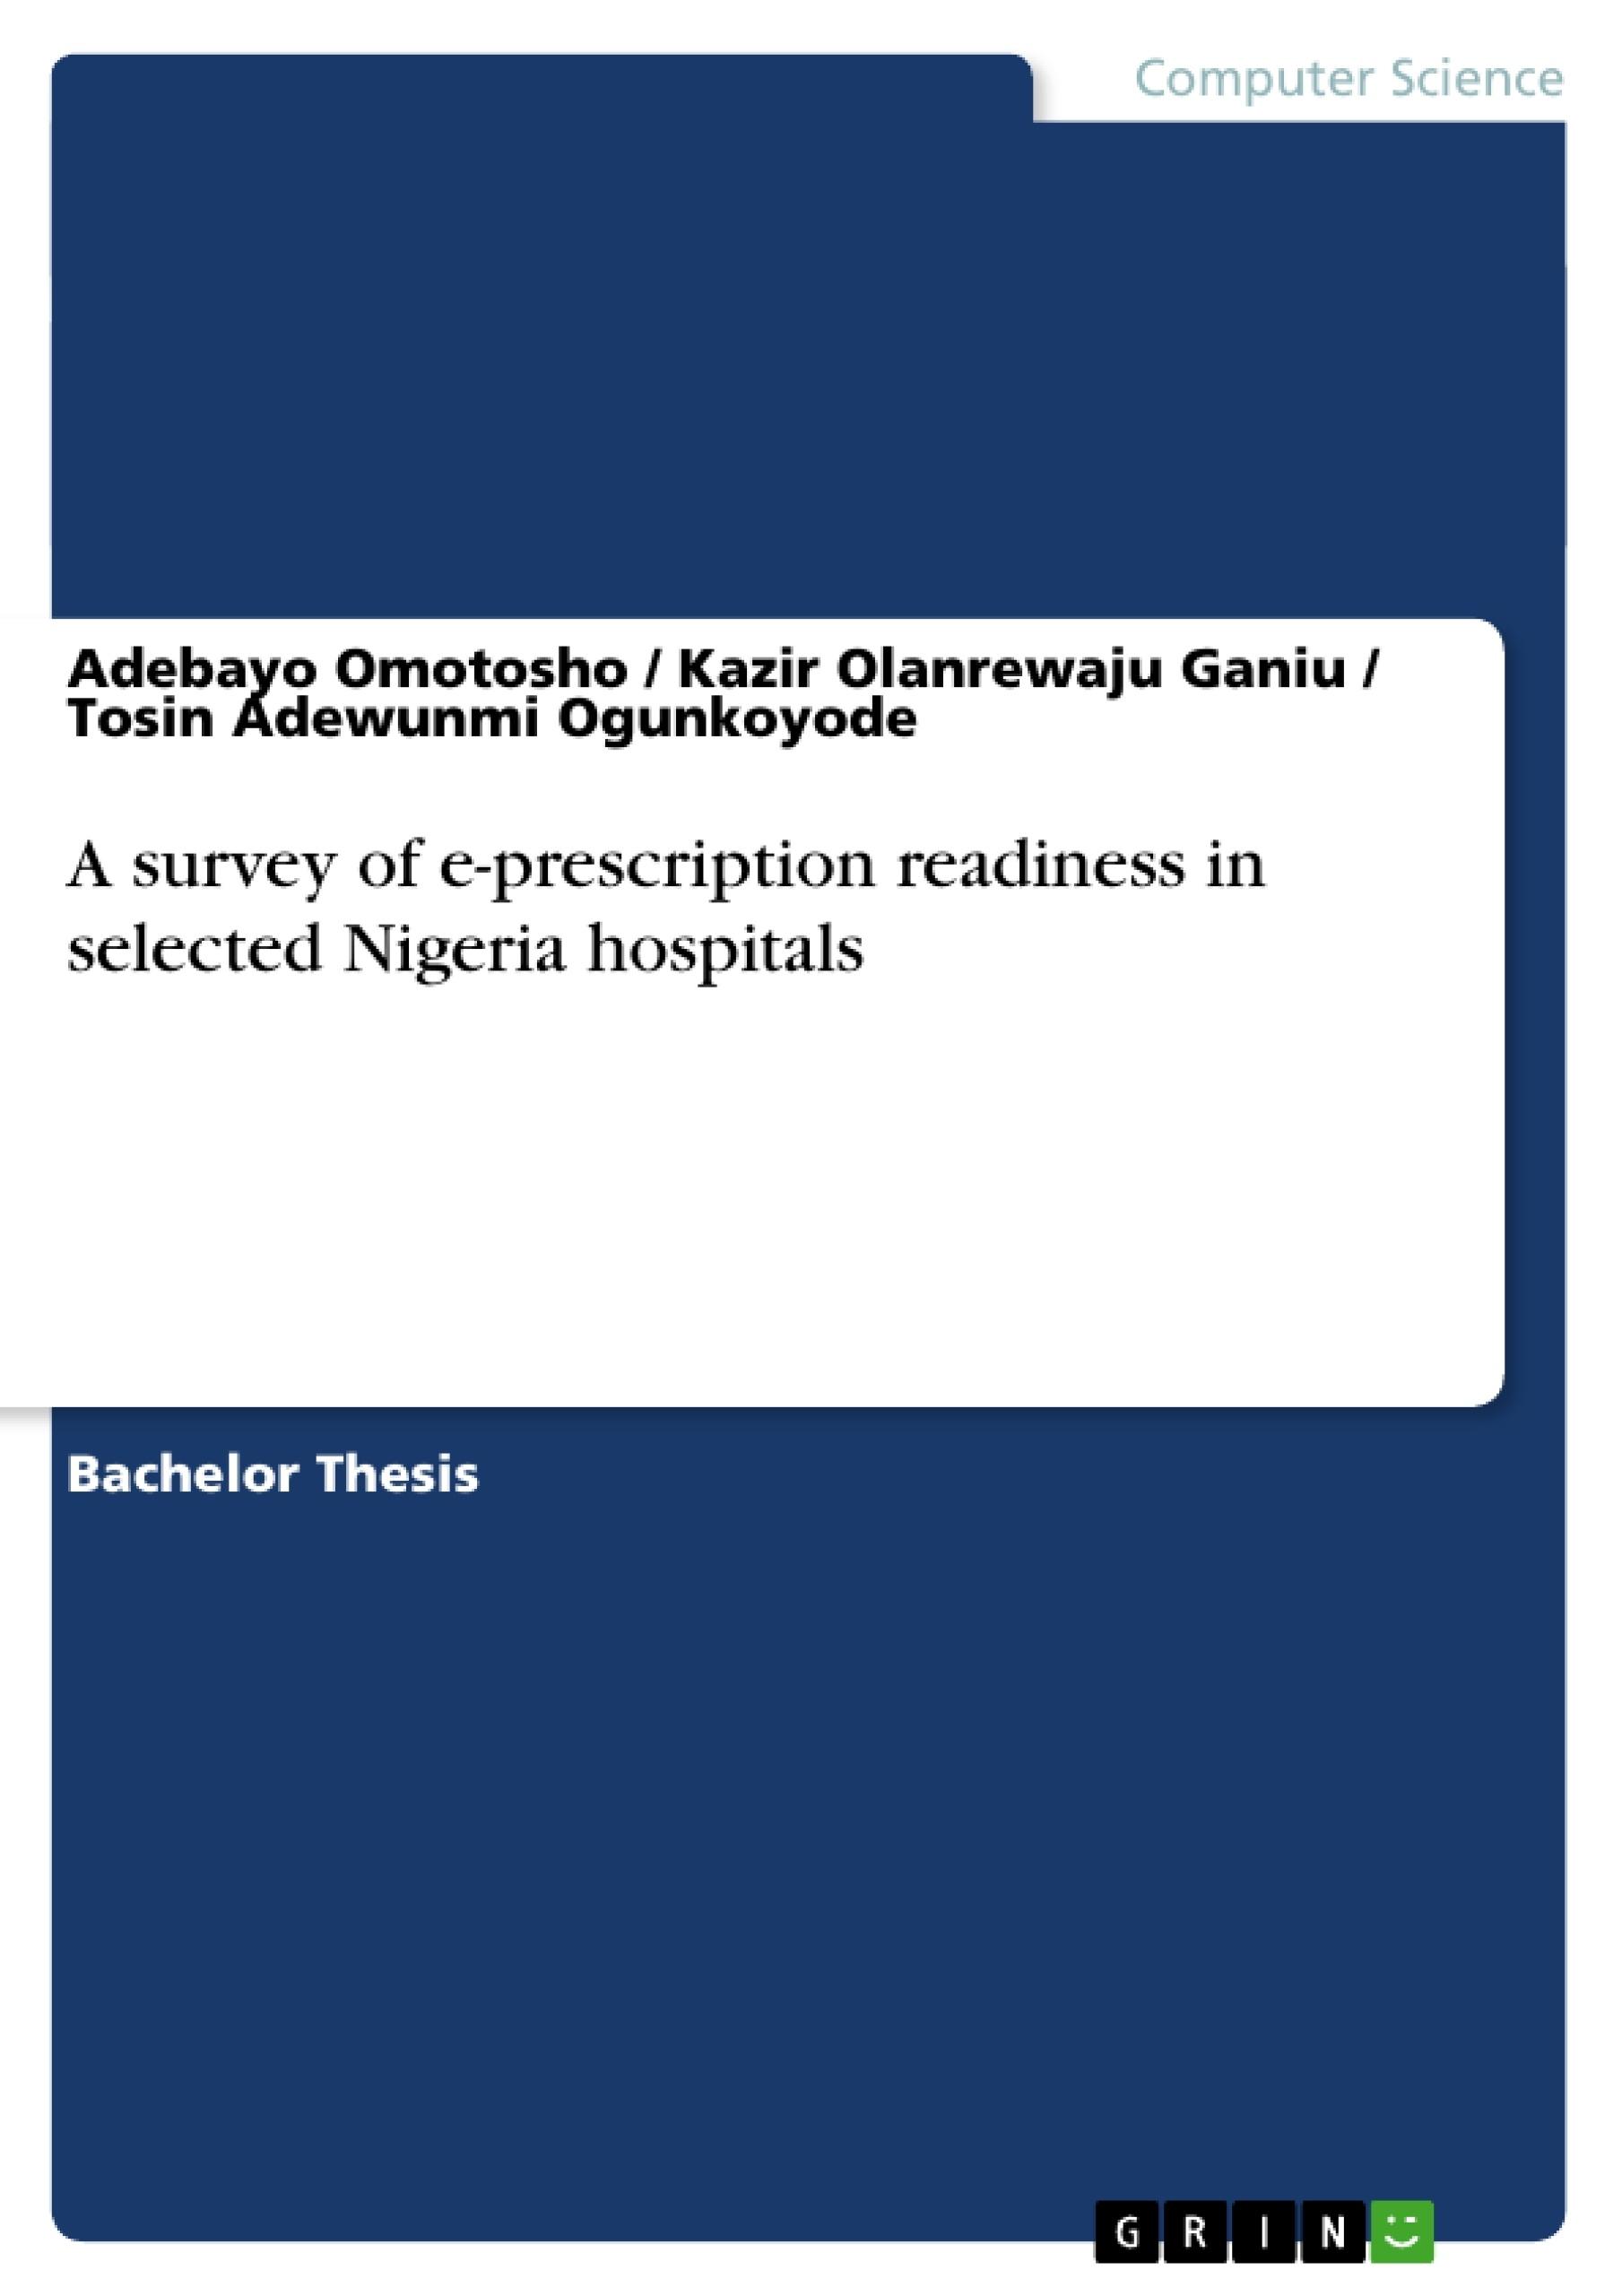 Title: A survey of e-prescription readiness in selected Nigeria hospitals